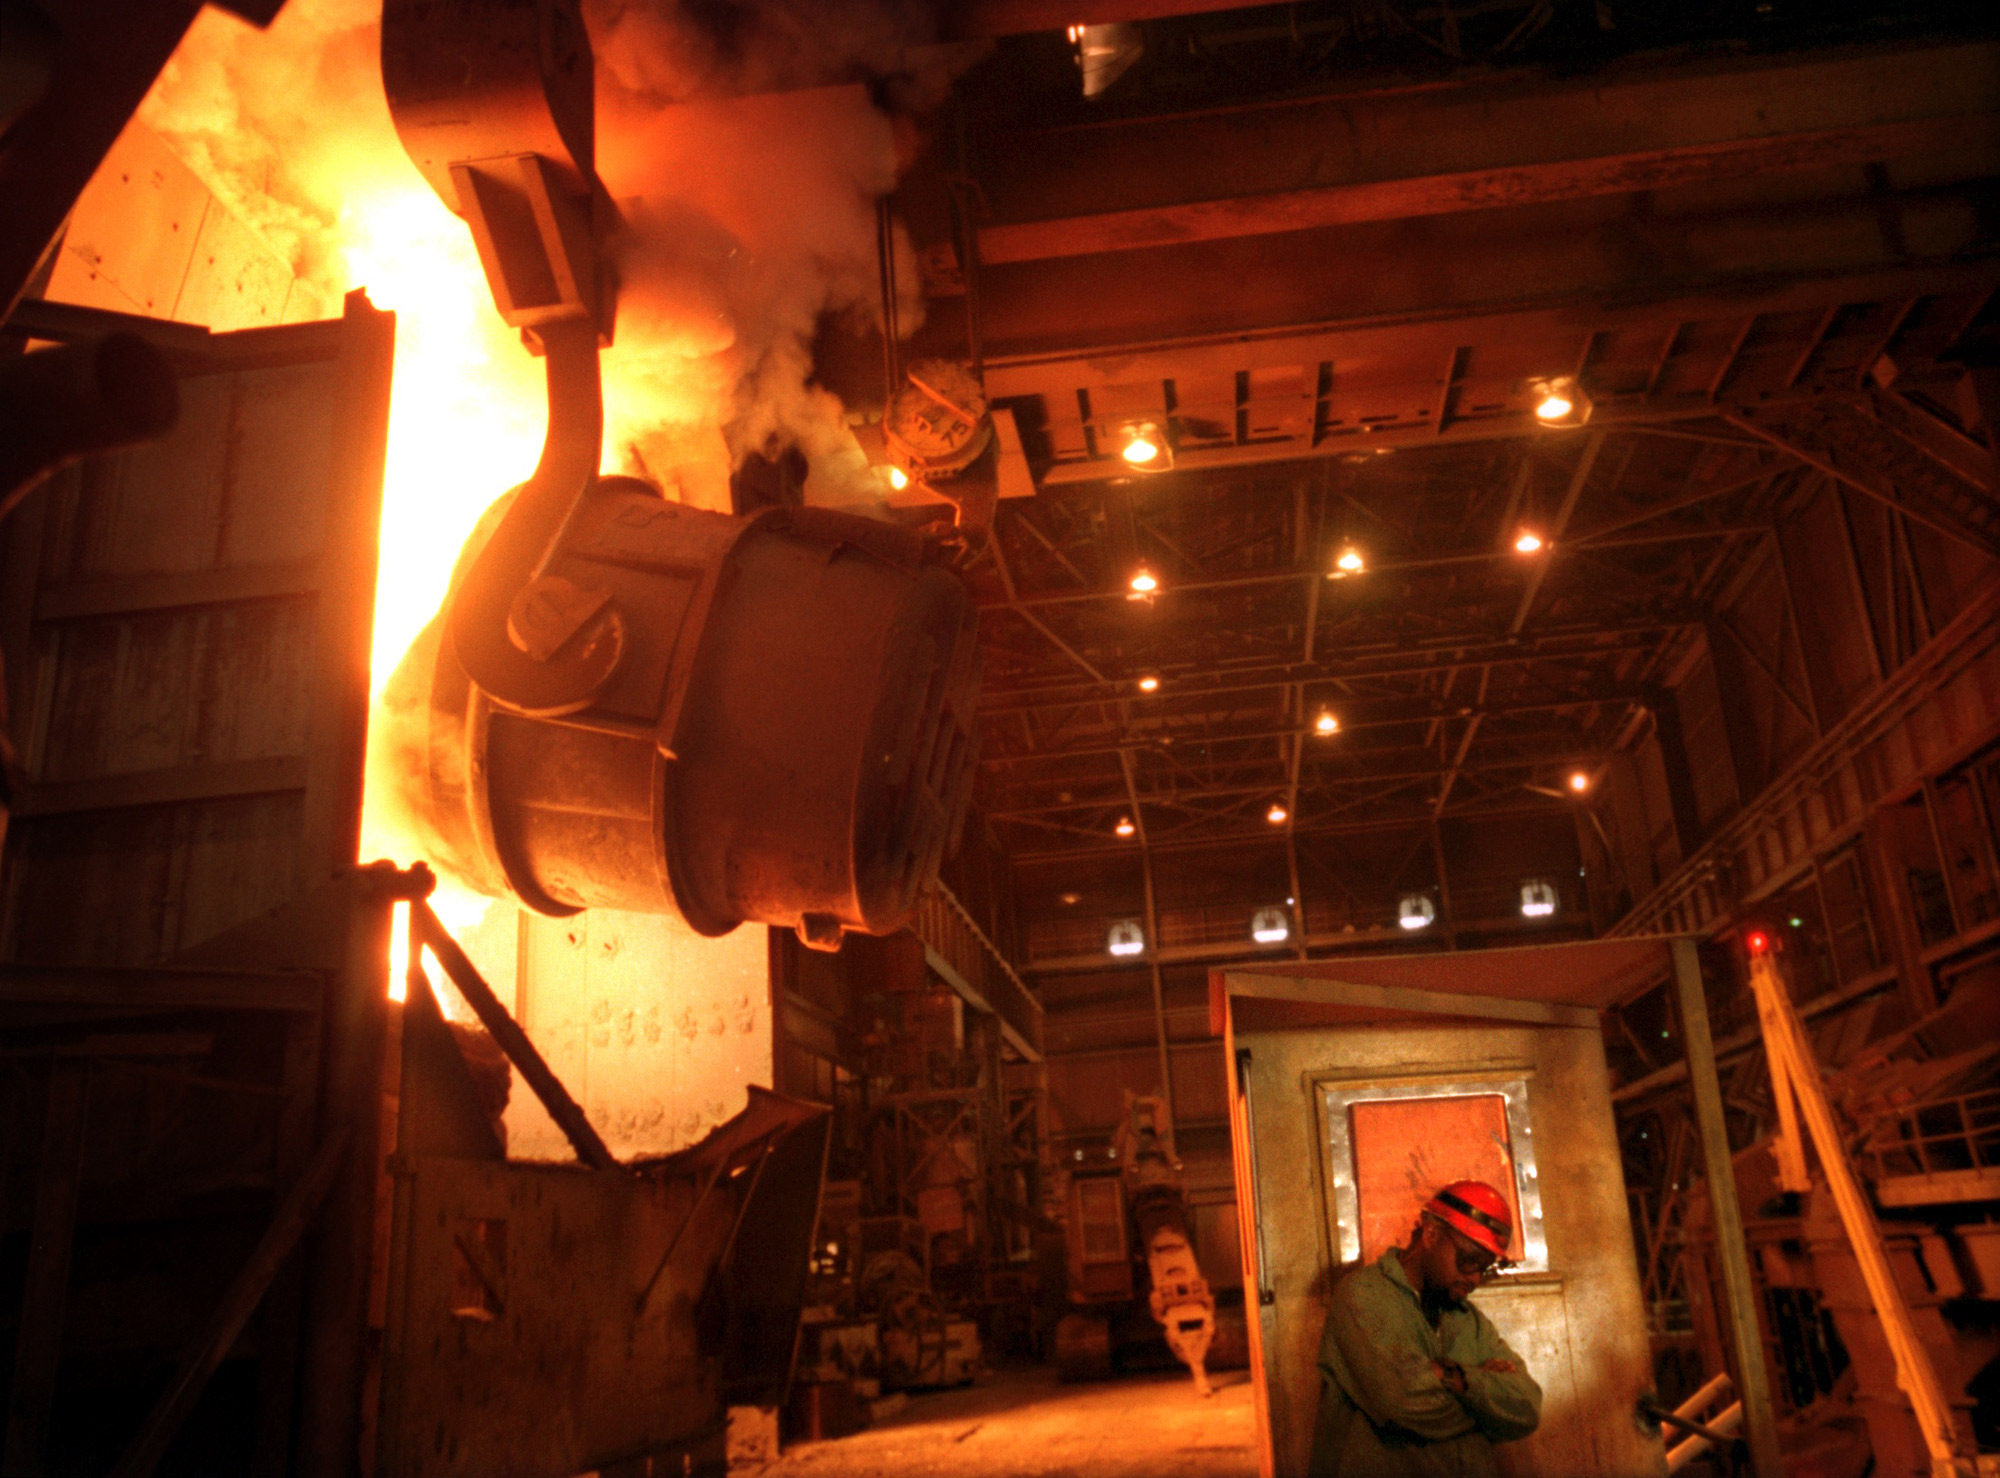 Steel production at Braddock's Edgar Thomson Works.